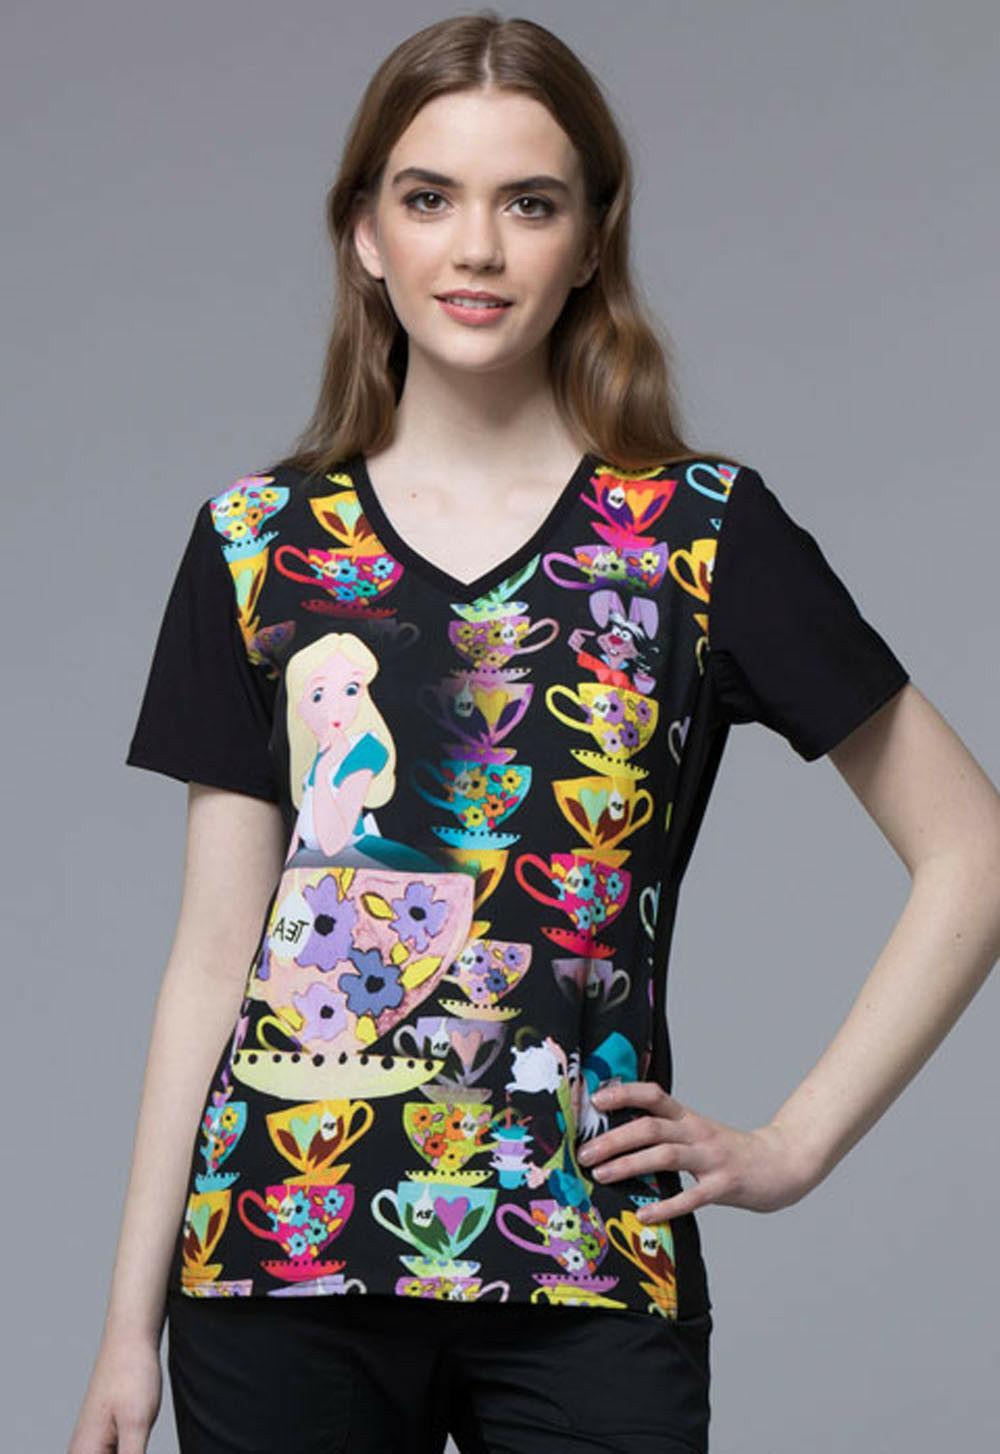 Alice in Wonderland Cherokee Scrubs Tooniforms Disney V Neck